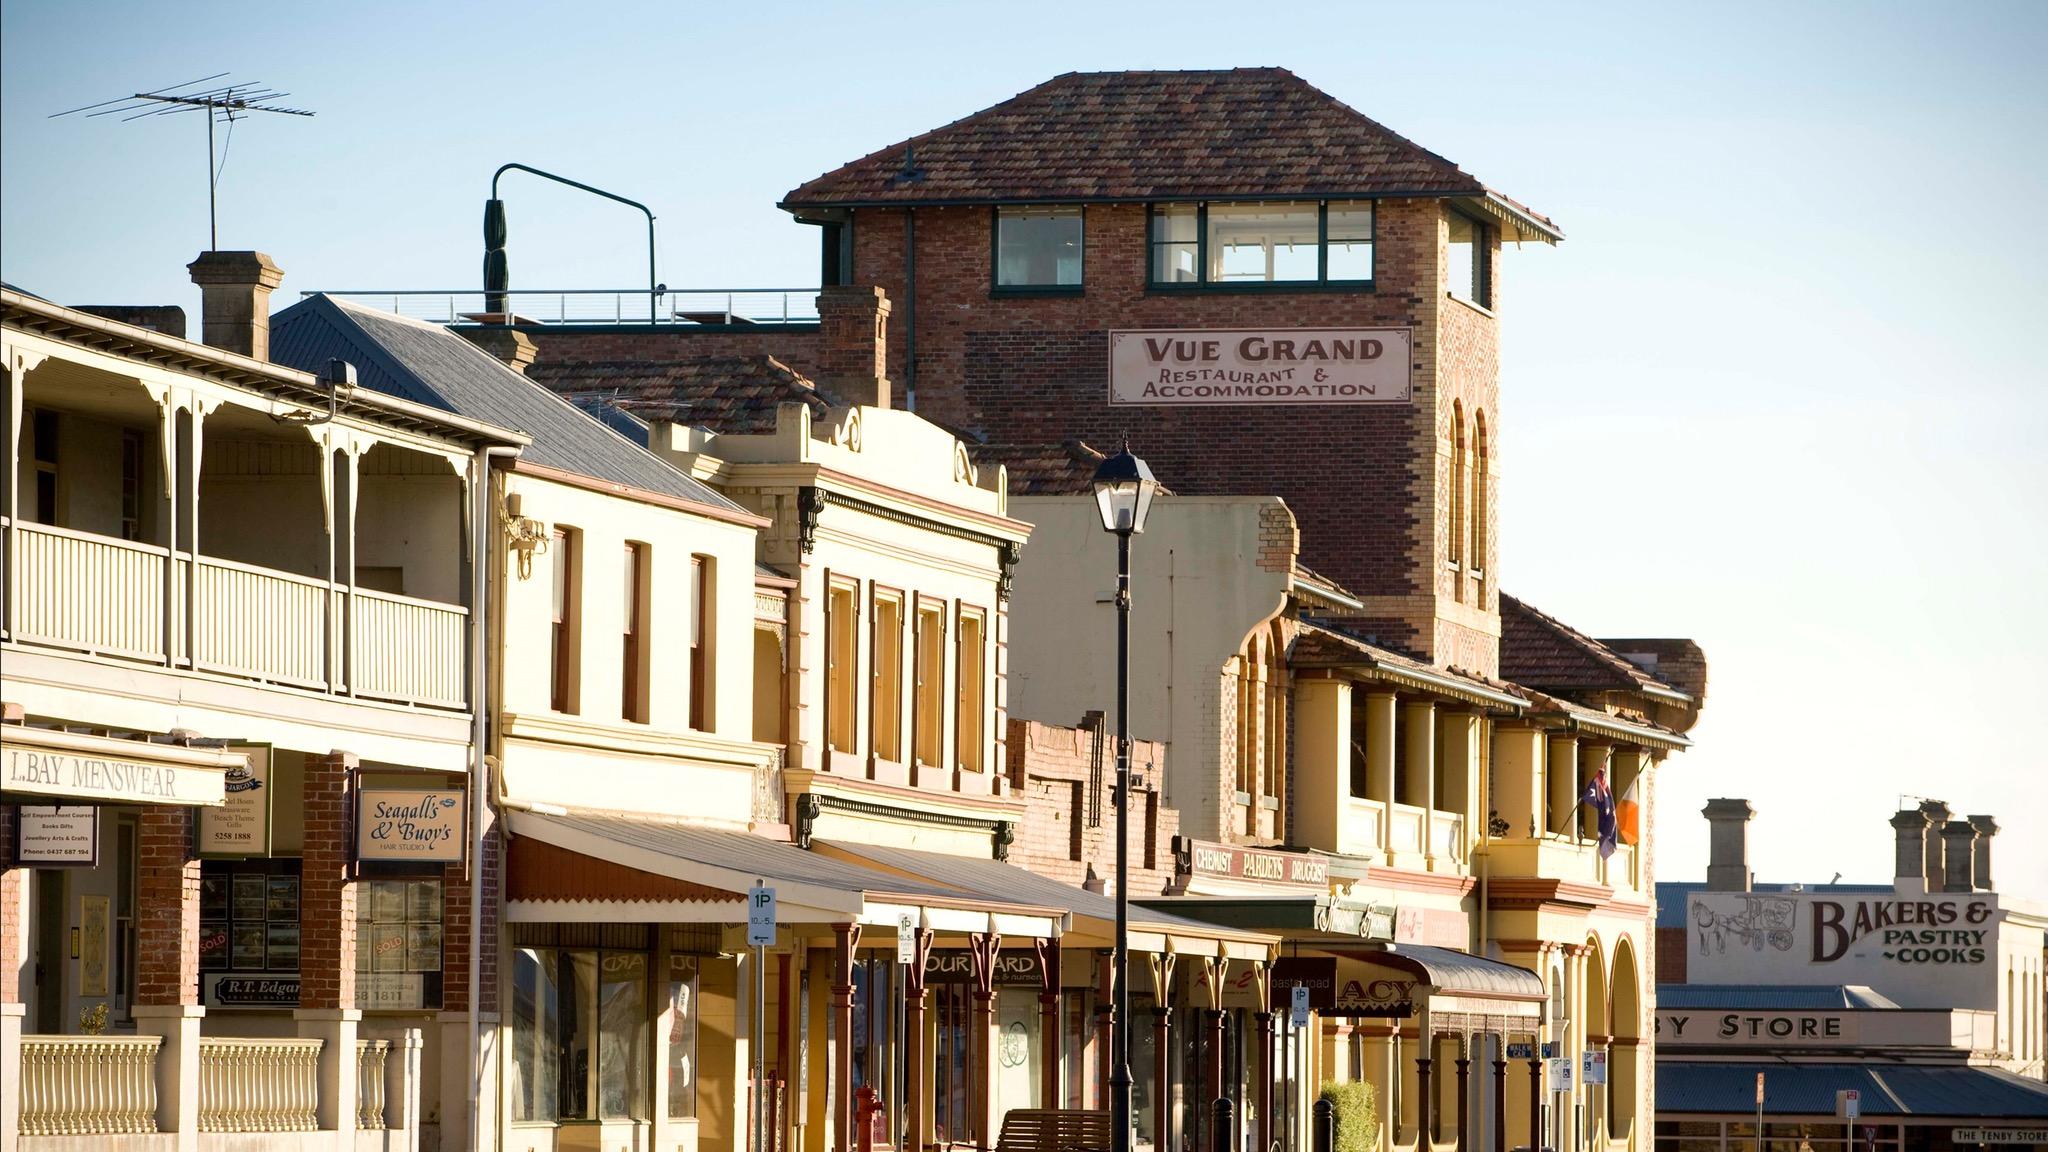 Vue Grand Street View